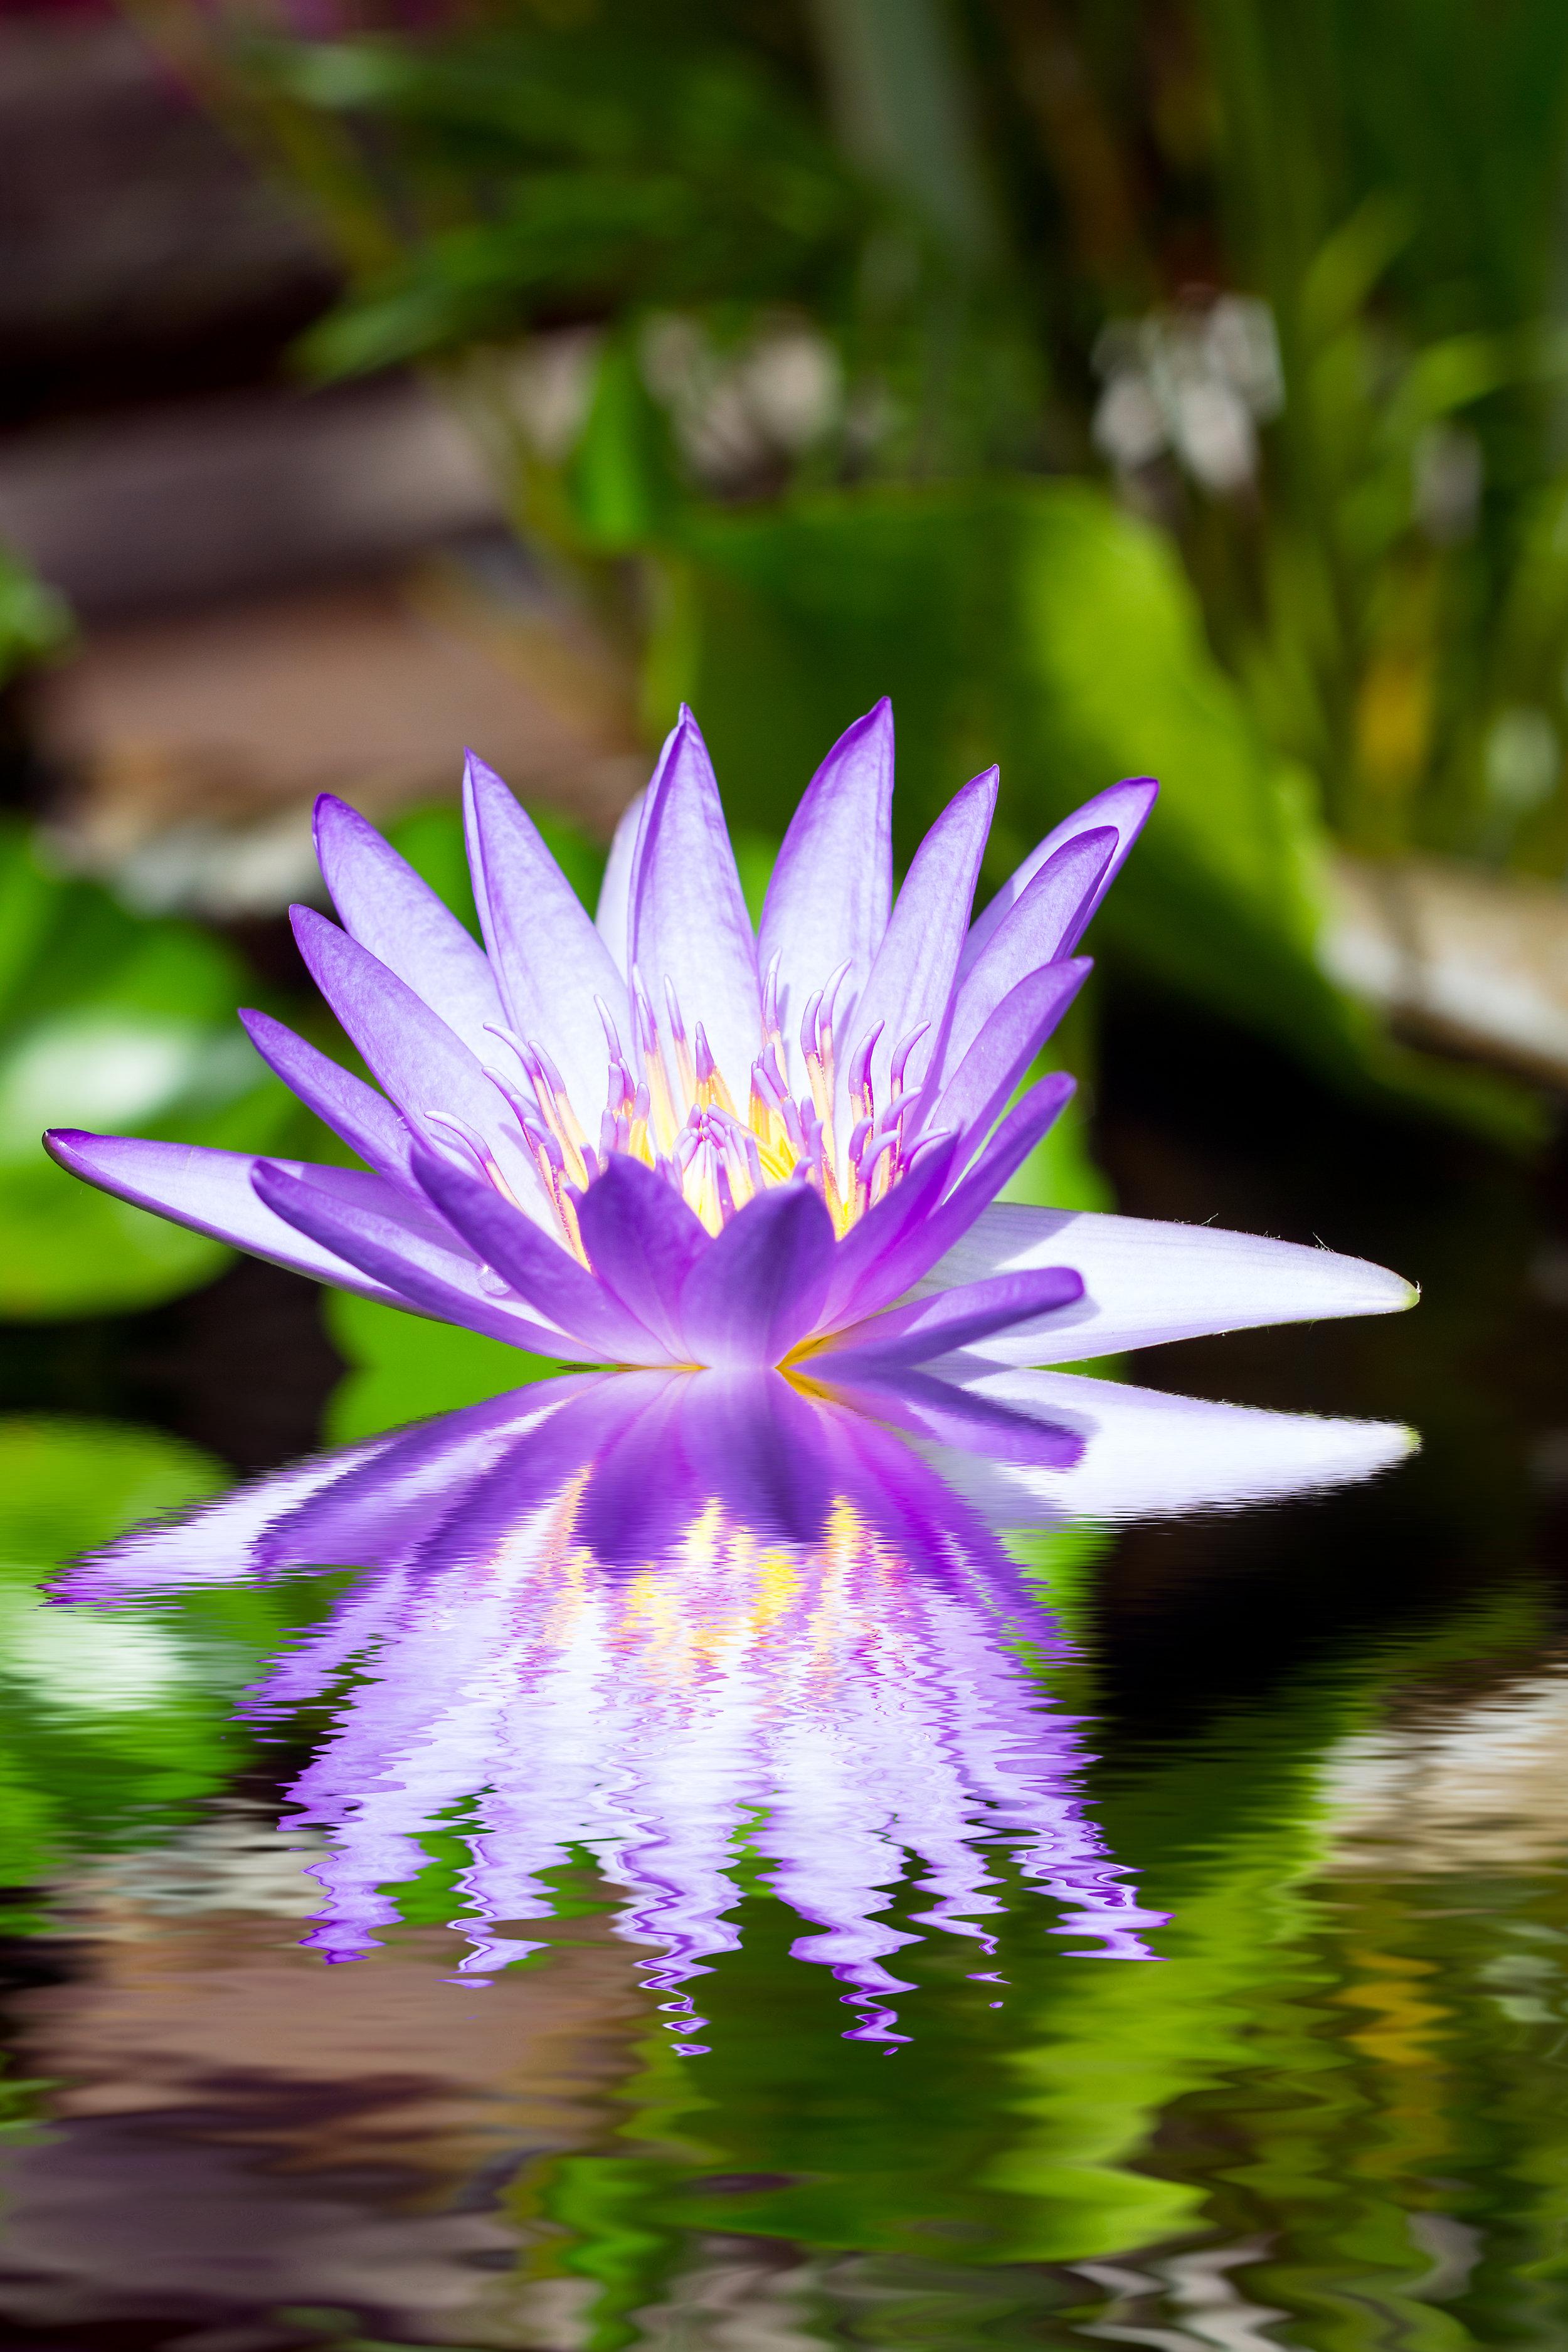 illuminated purple loctus reflection small.jpg